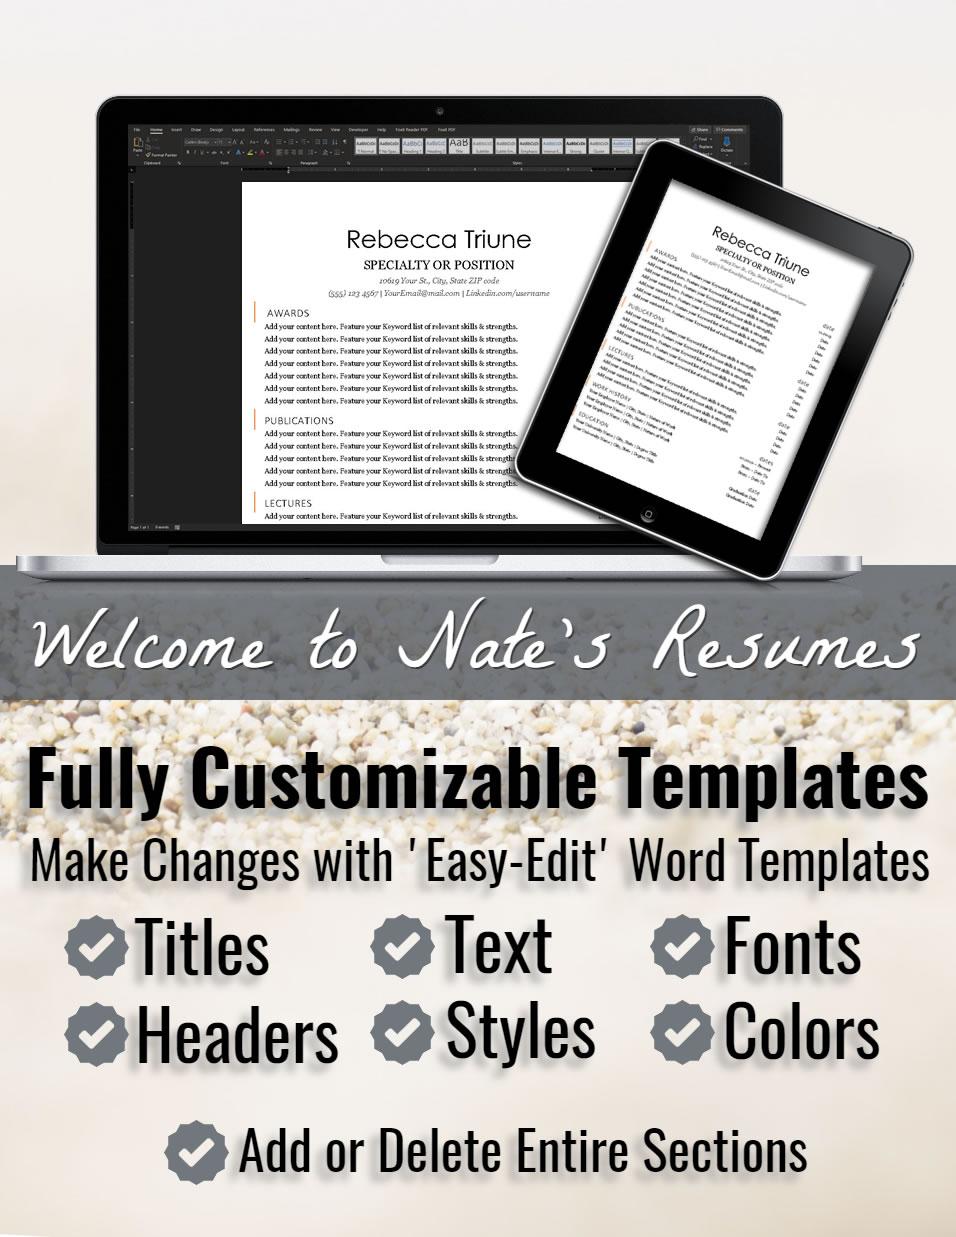 Showcase - Make-Easy-Edits-to-Templates-LONG